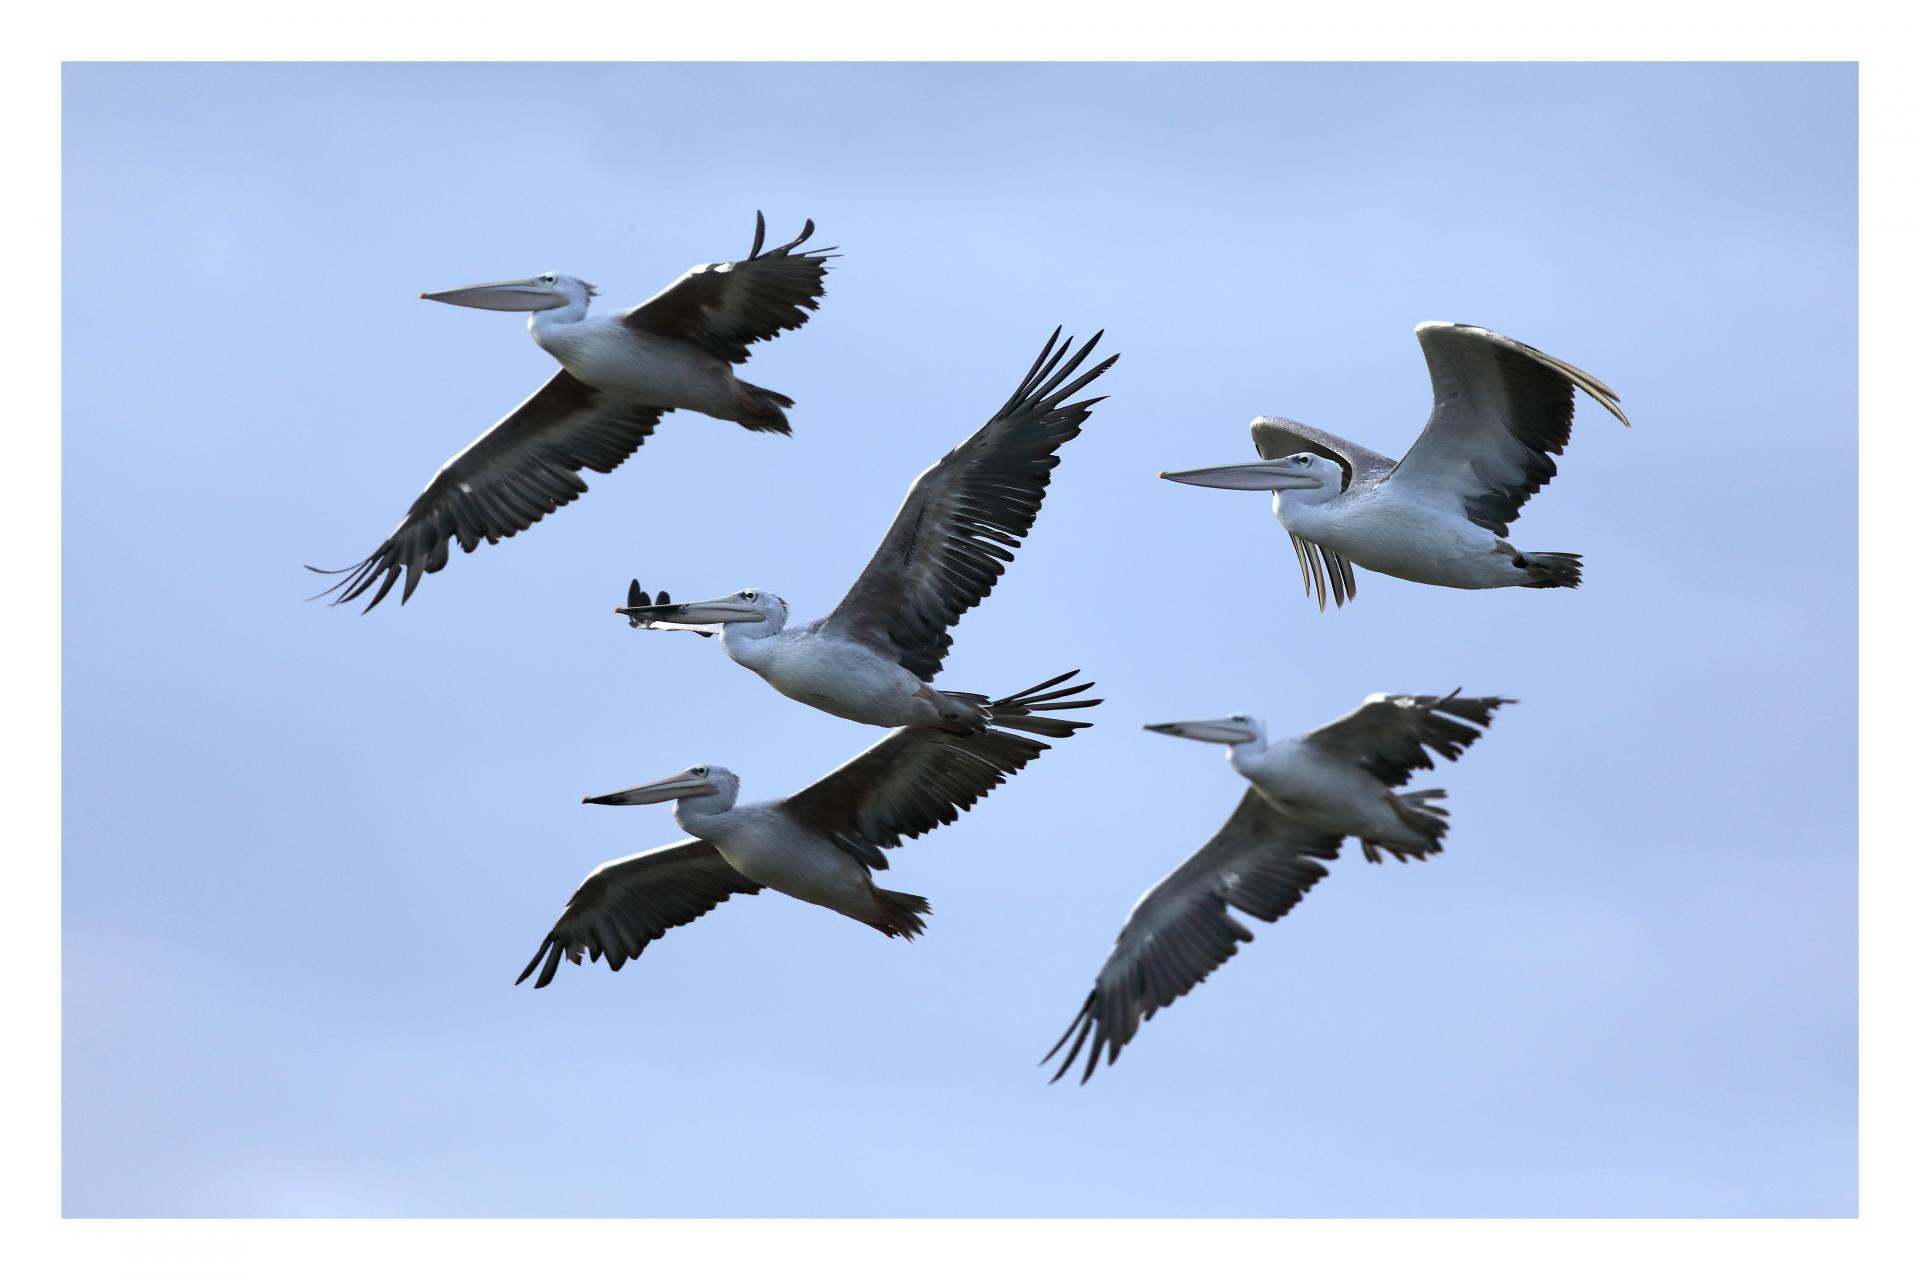 Pélicans gris en vol